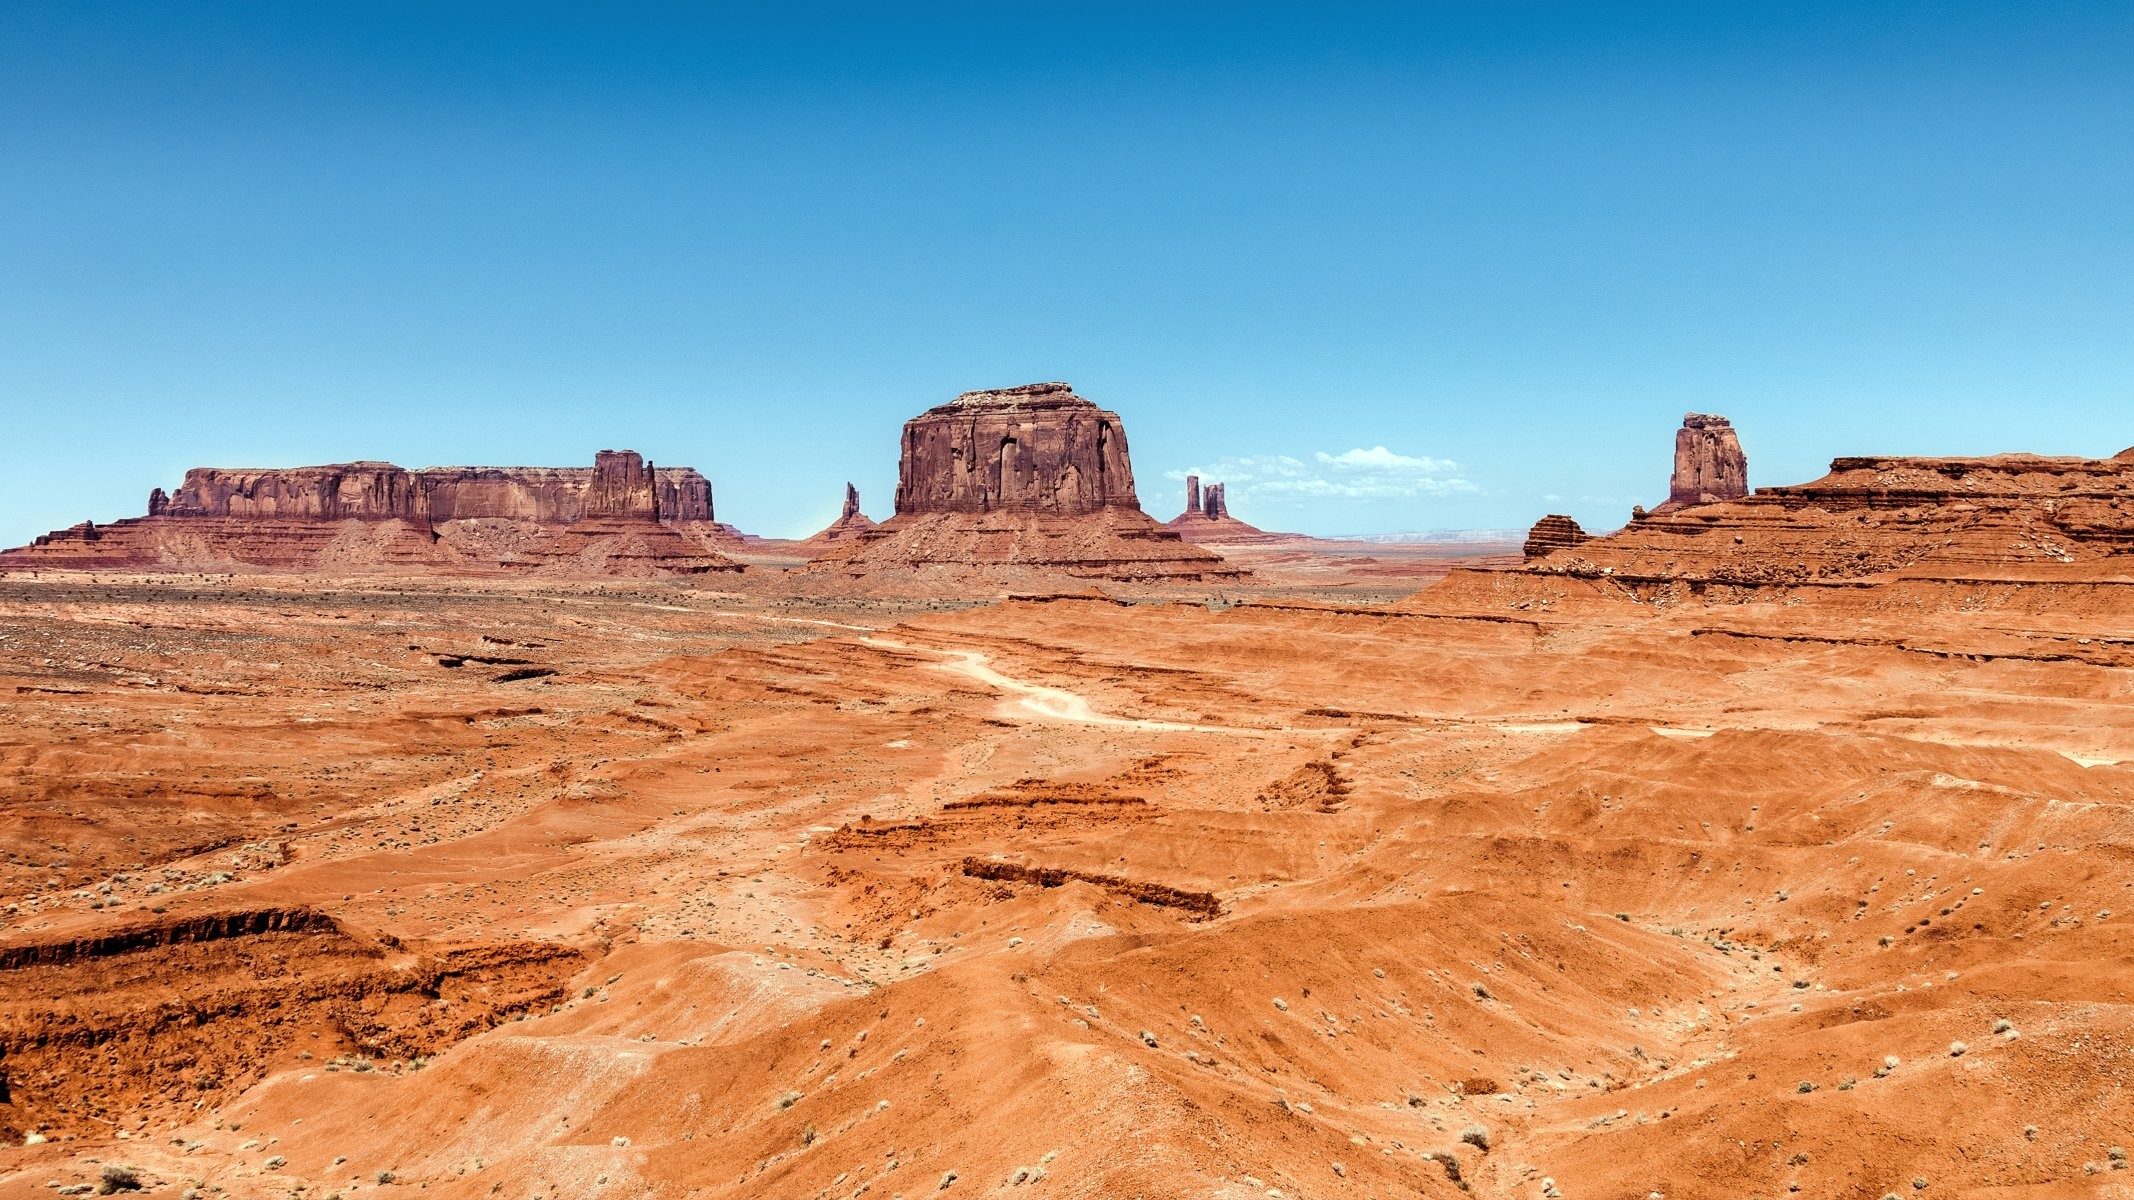 monument valley monument valley mountain sky sand desert utah arizona  united states monument valley monument valley